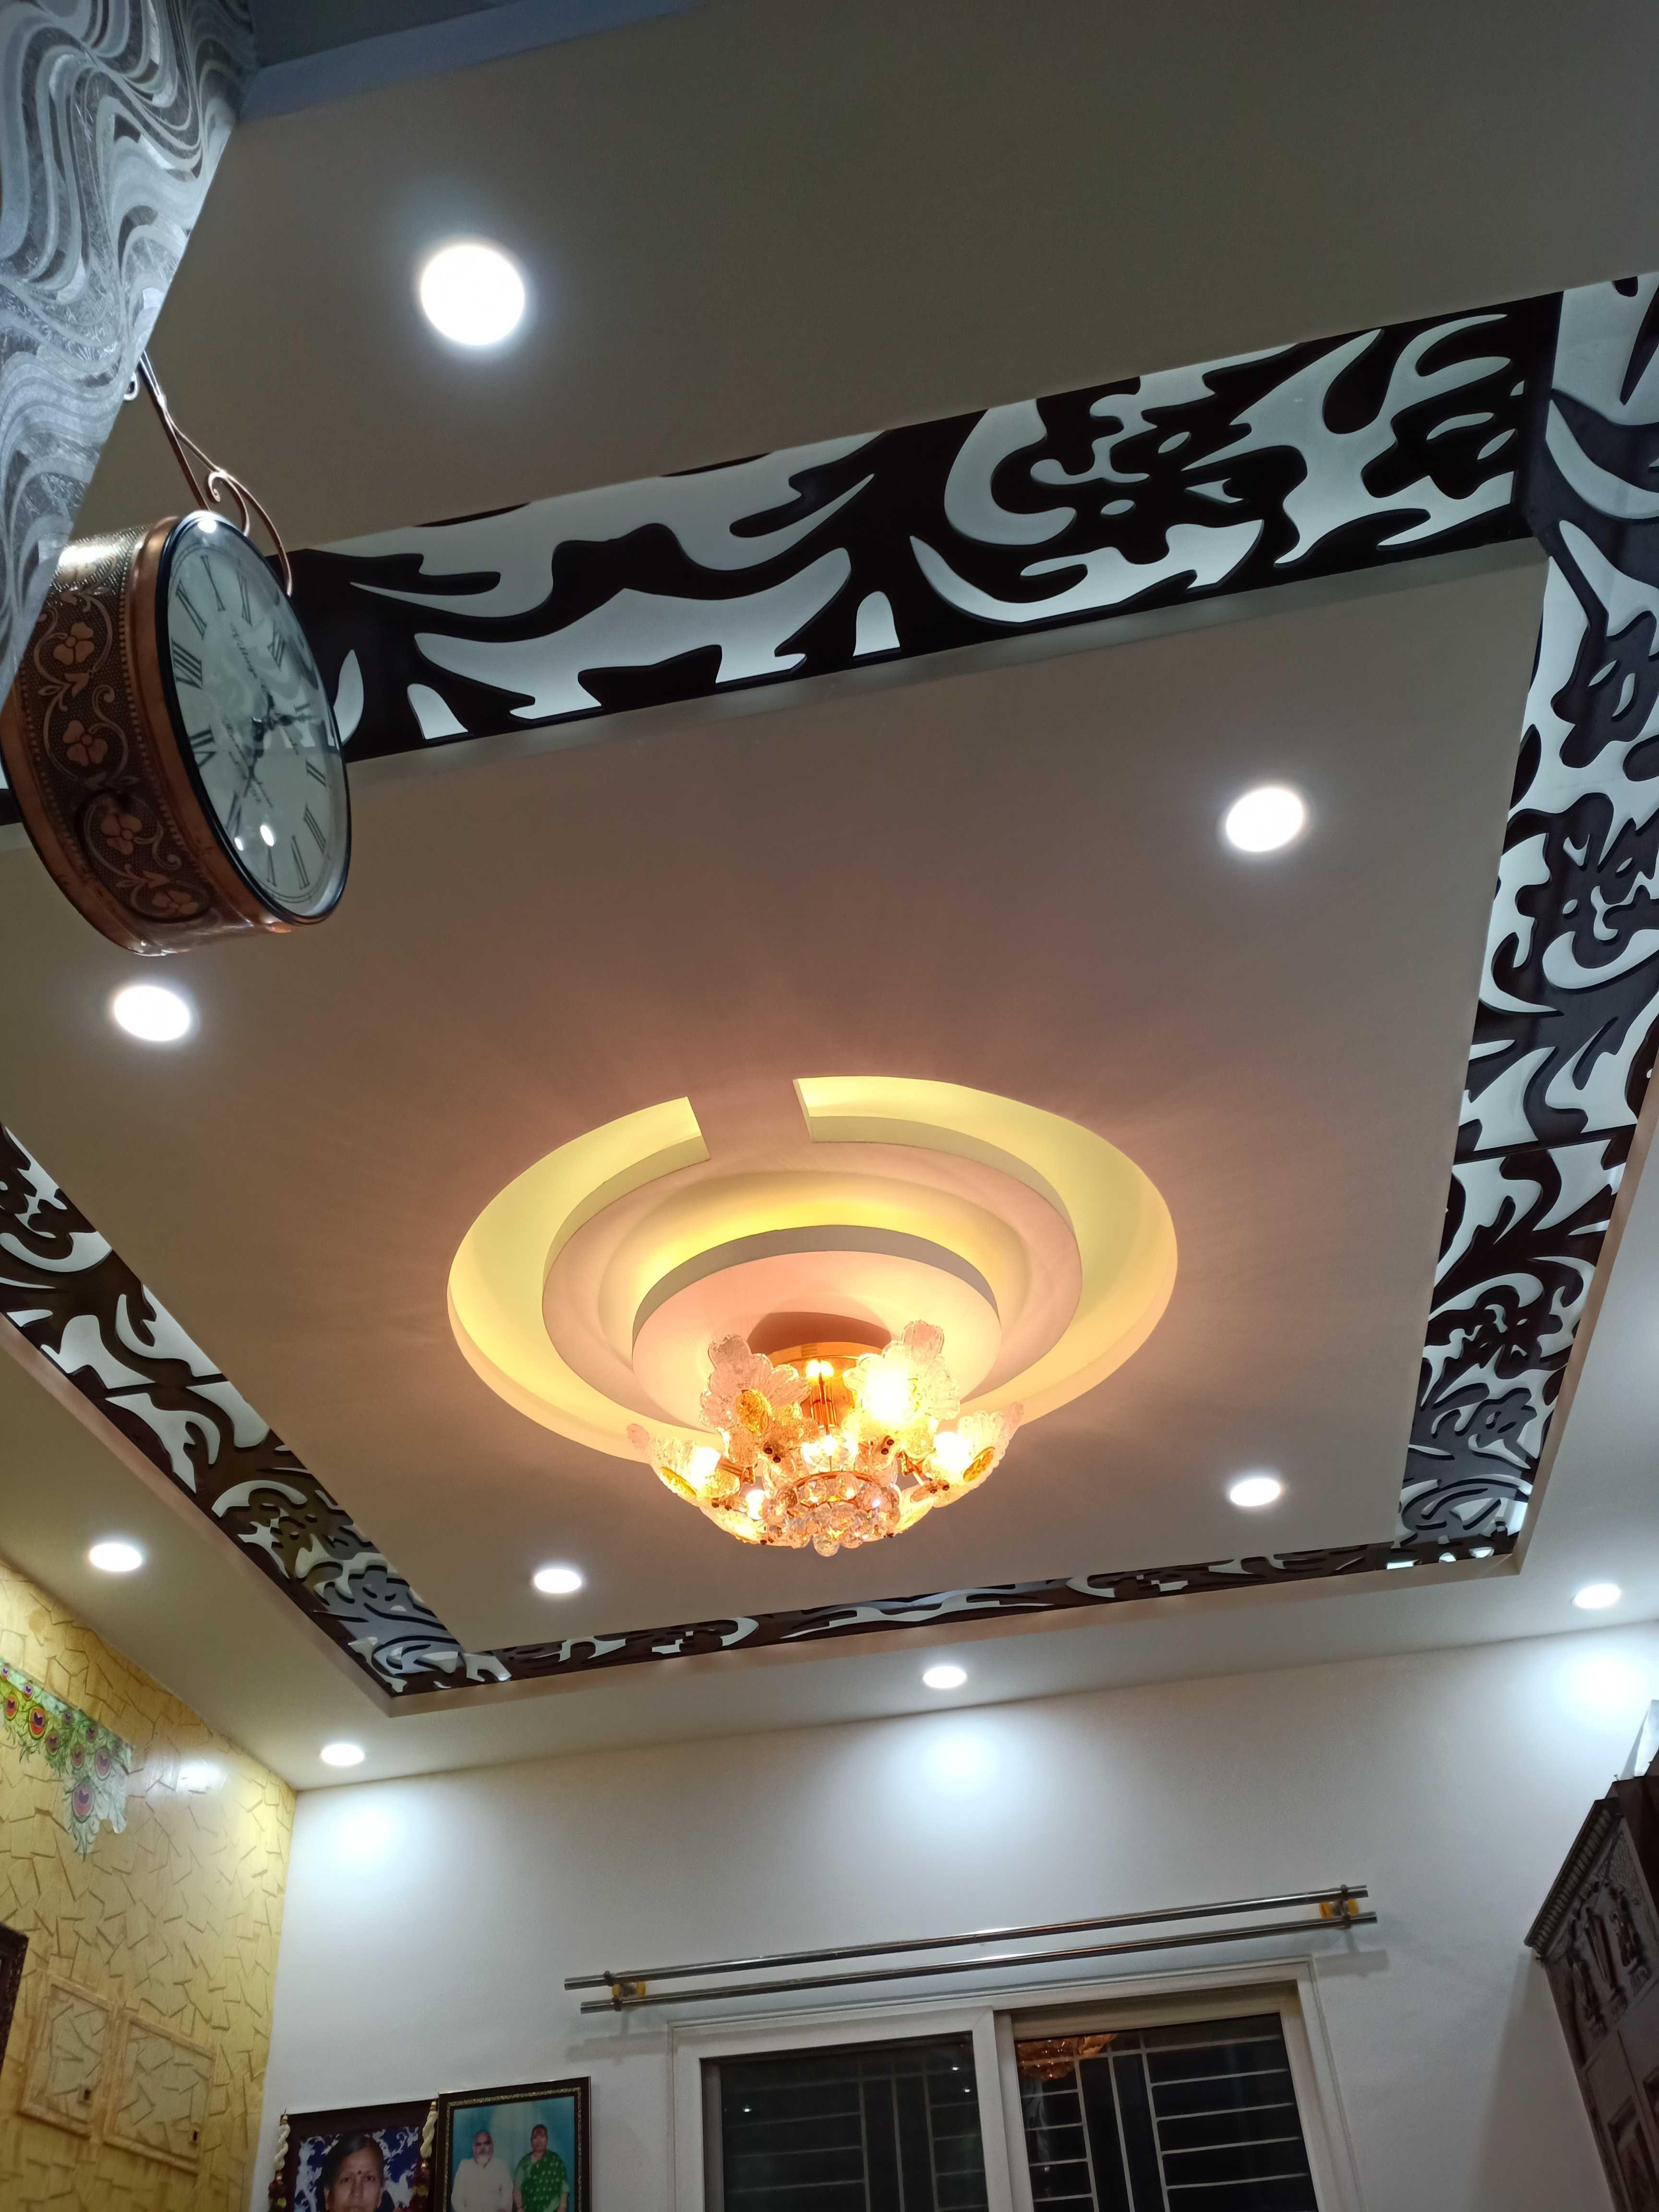 Elli Home Fins Pvt Ltd In Madiwala Bangalore 560068 Sulekha Bangalore